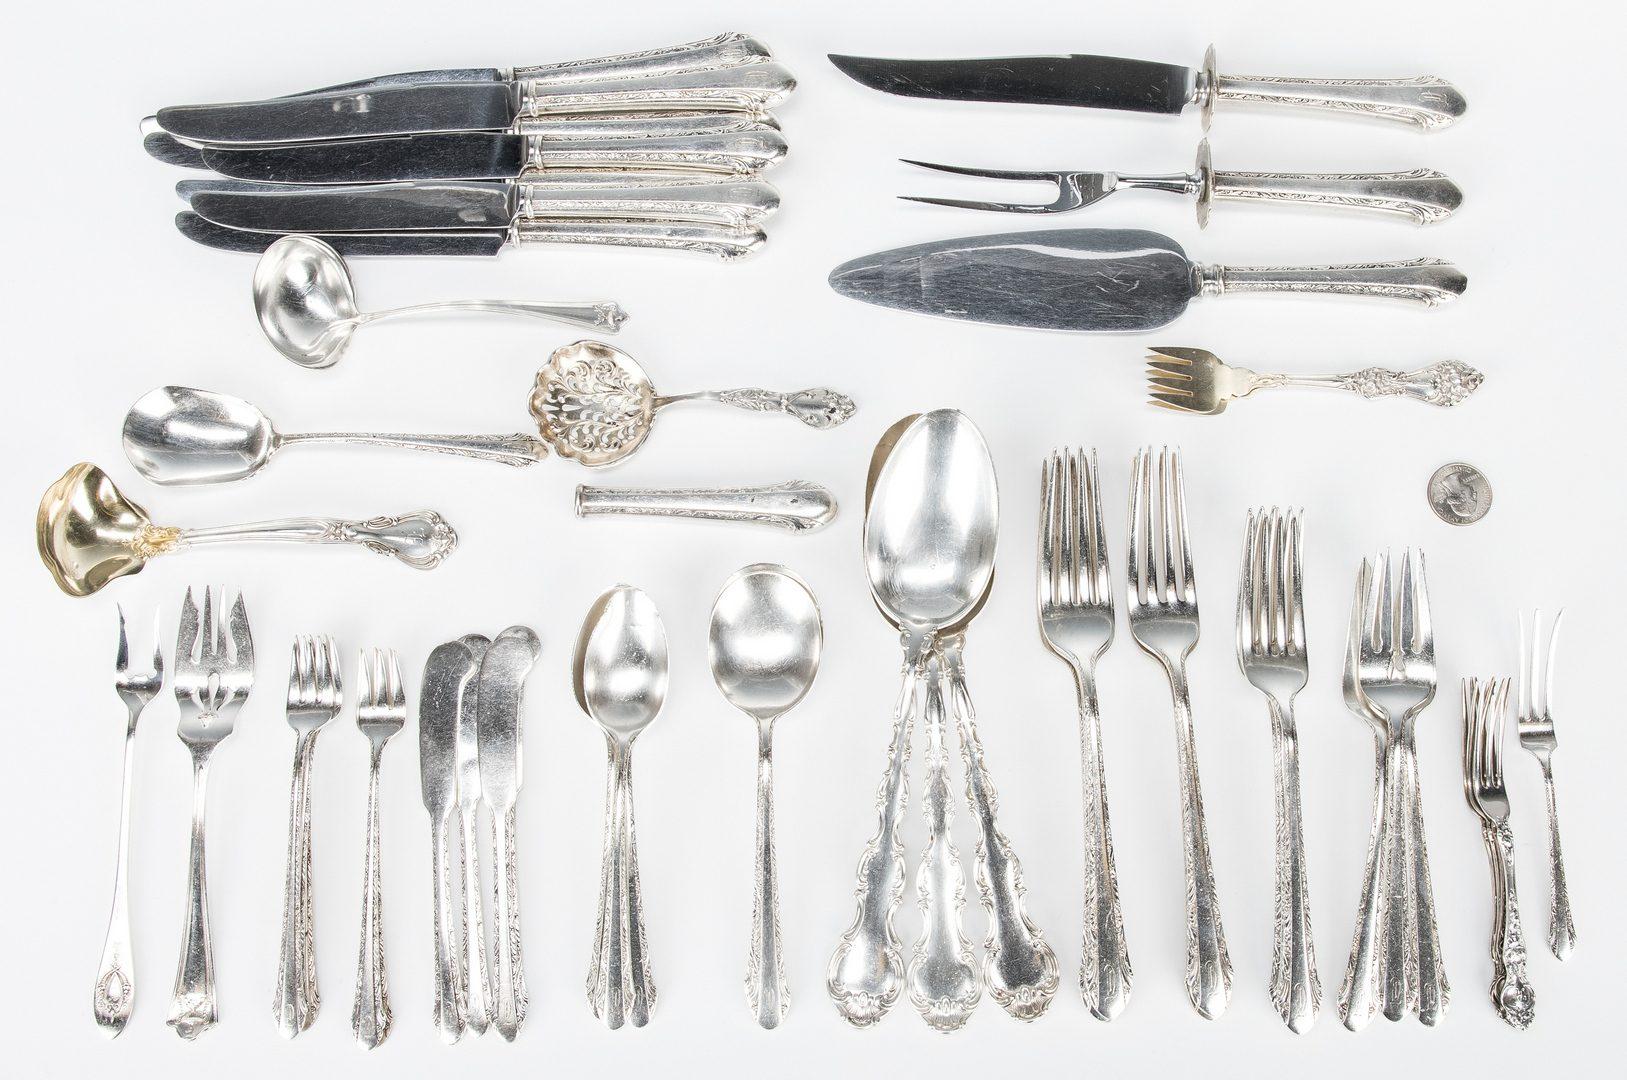 Lot 39: Alvin Sterling Flatware & Misc. Sterling Flatware, 52 items